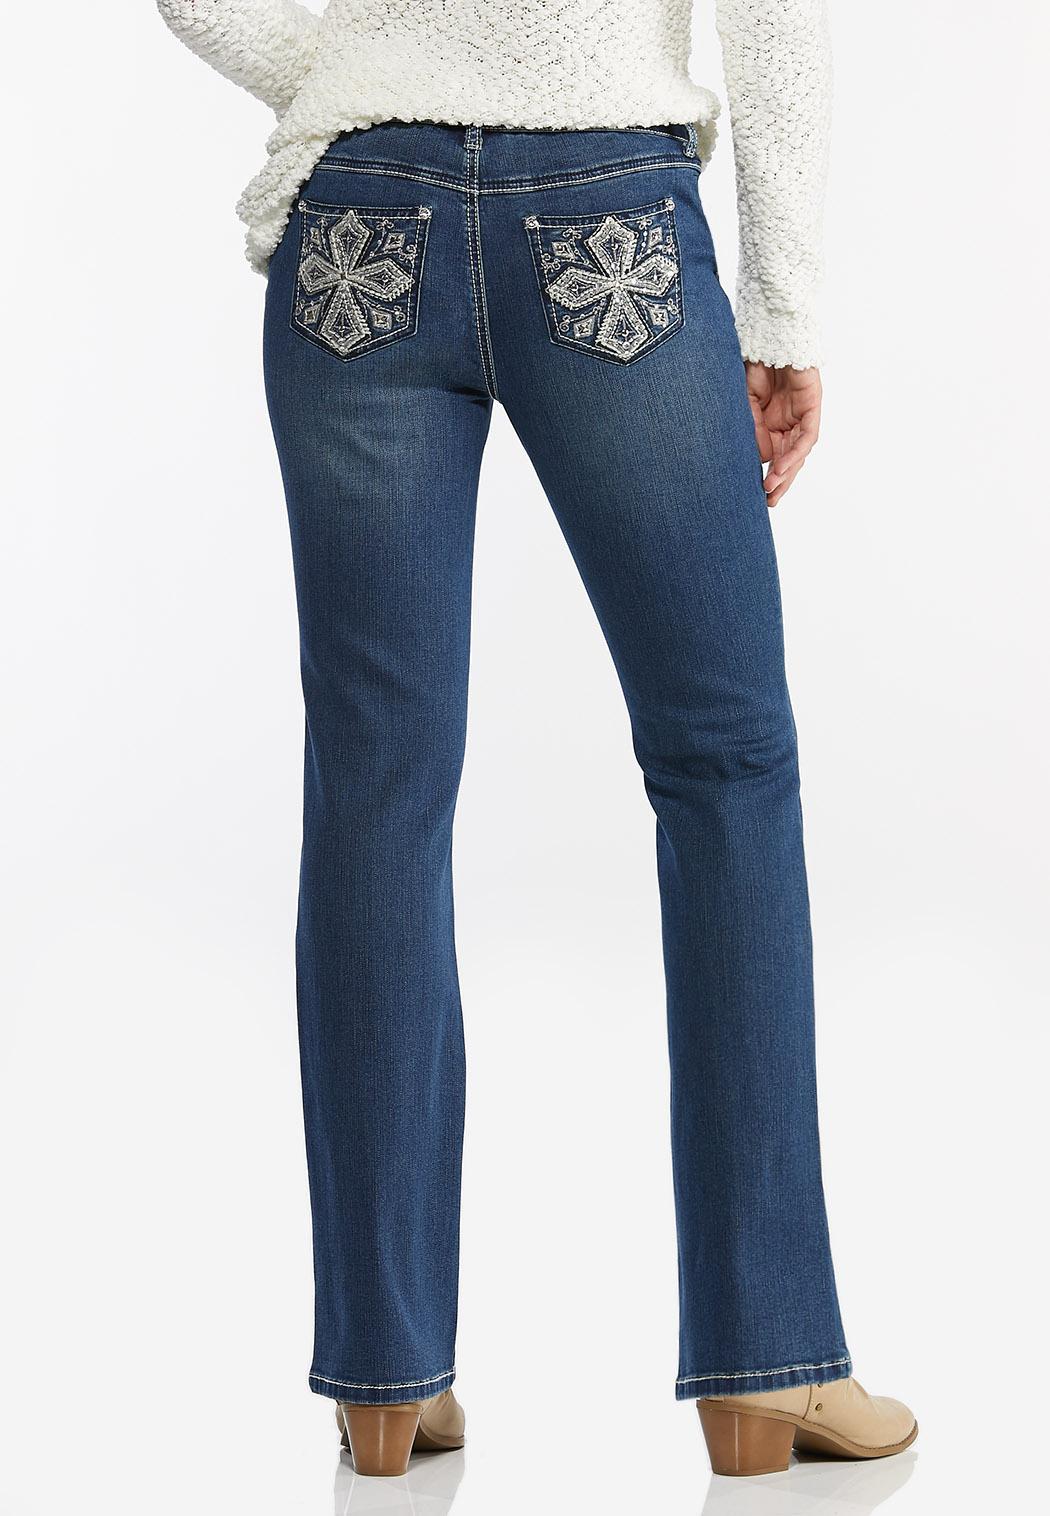 Rhinestone Cross Embellished Jeans